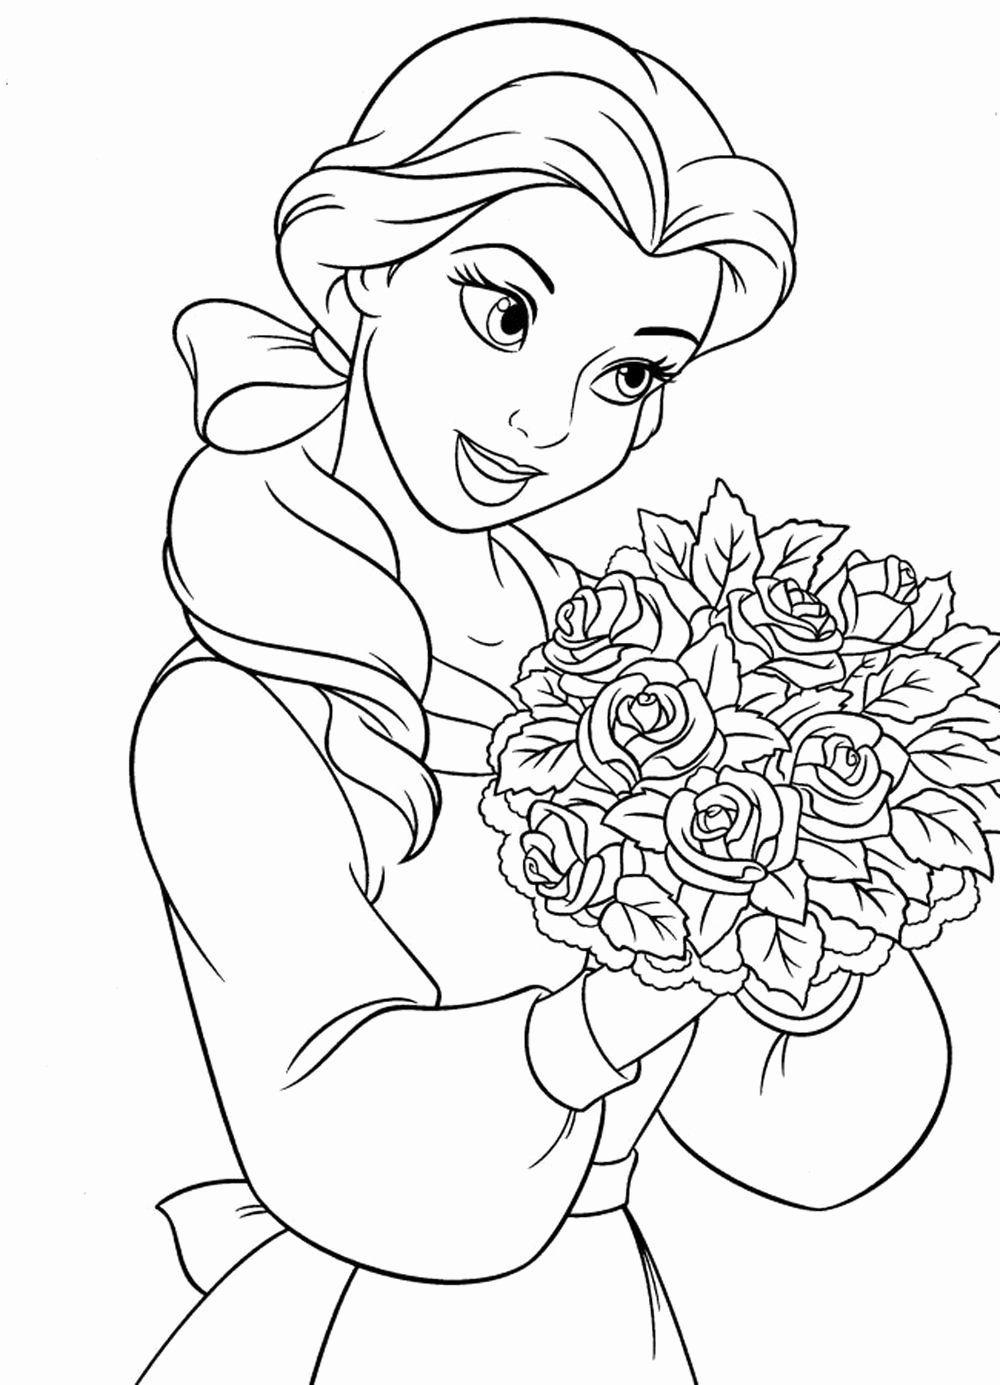 Coloring Pages Disney Princess en 24  Coloriage princesse